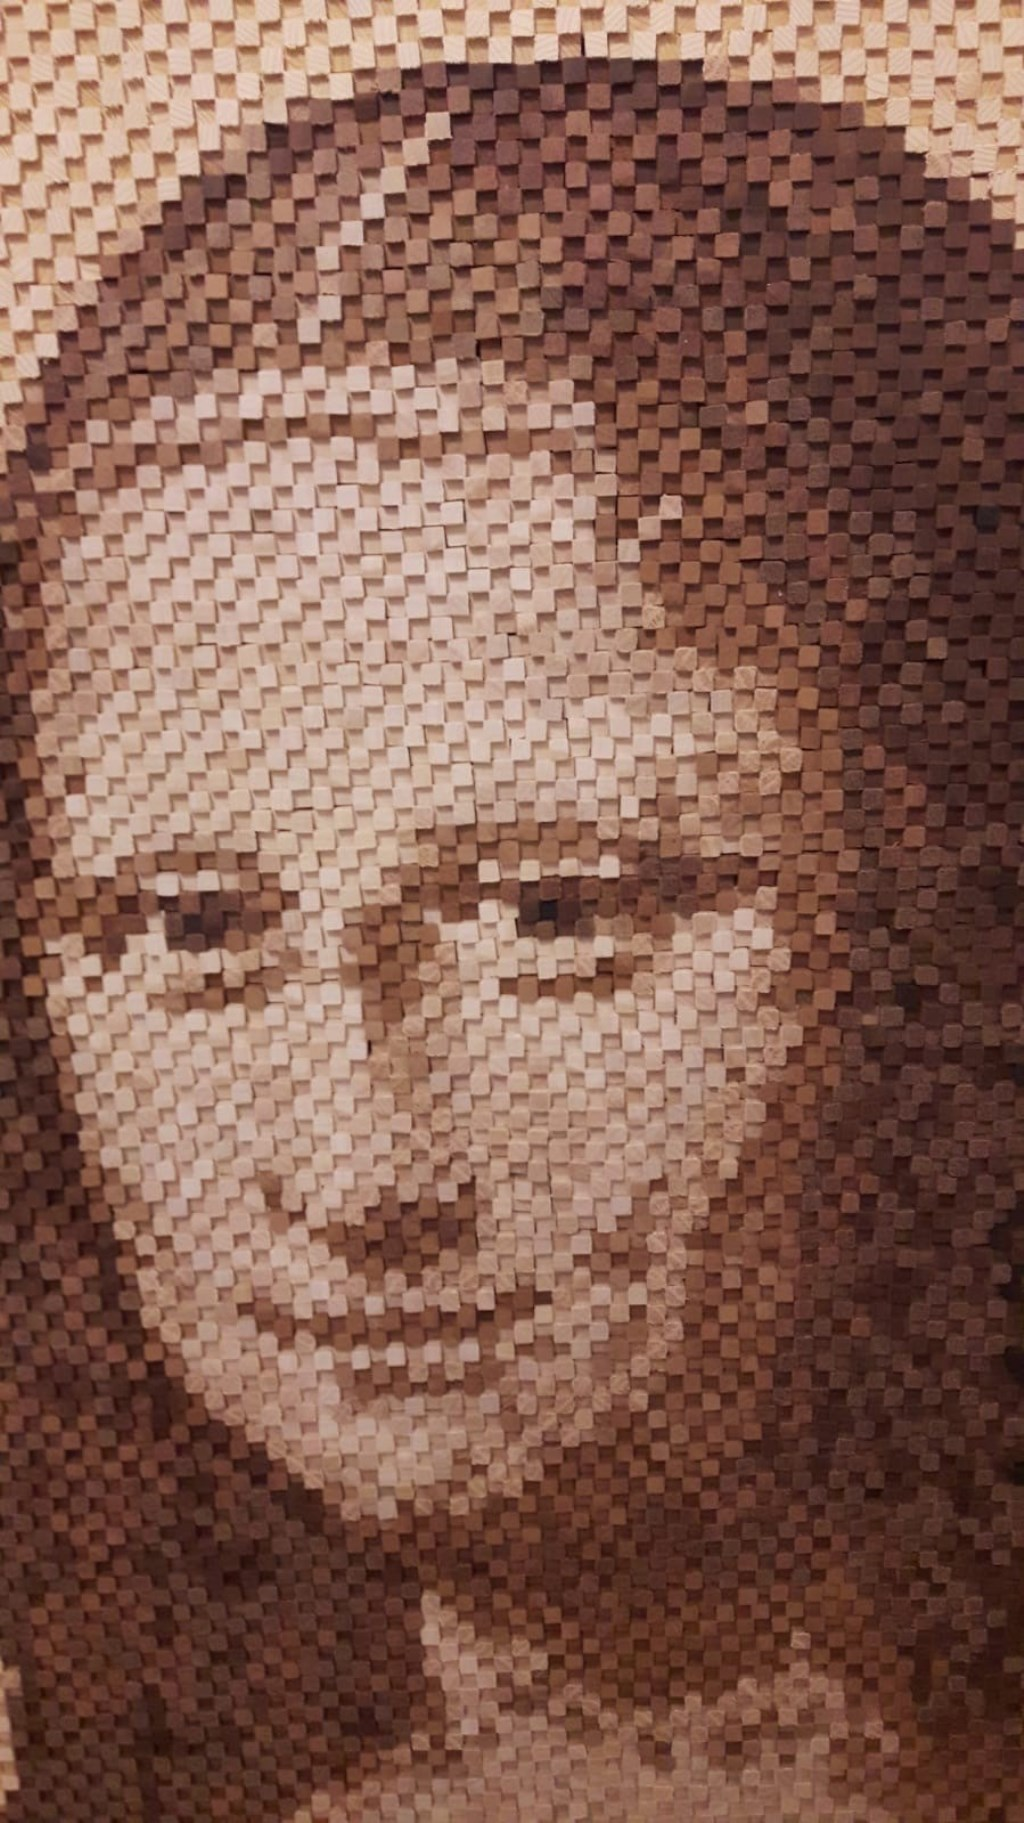 Mona Lisa.   © rodi